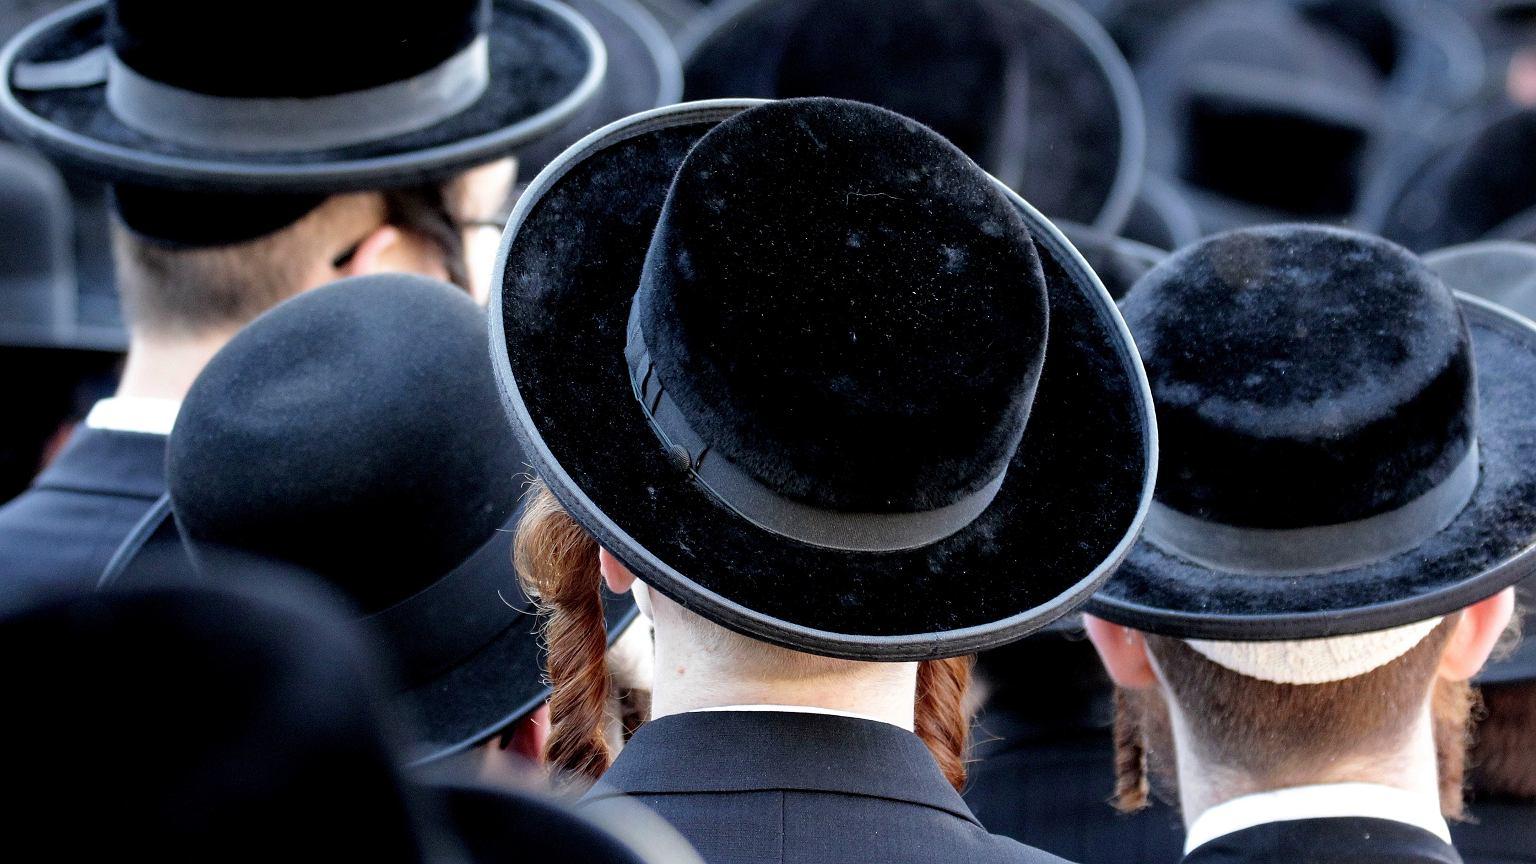 Tłum Żydów